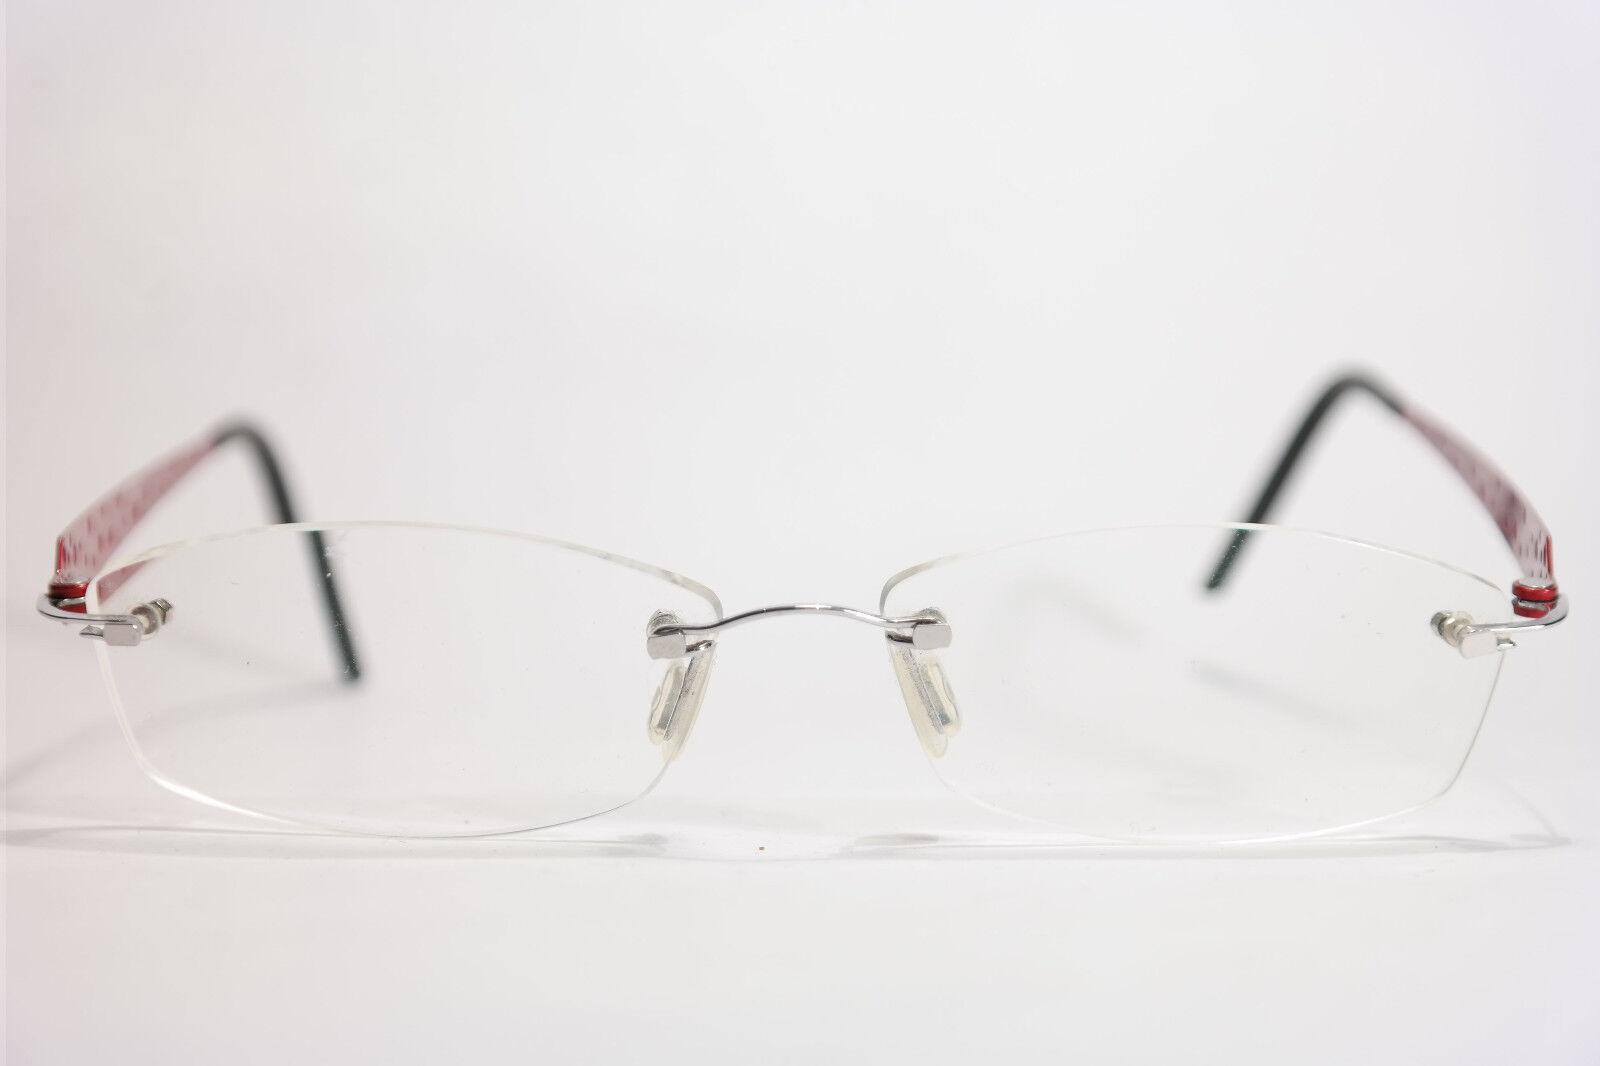 Minima  50[]20 150 Rot randlos Brillengestell Brille eyeglasses